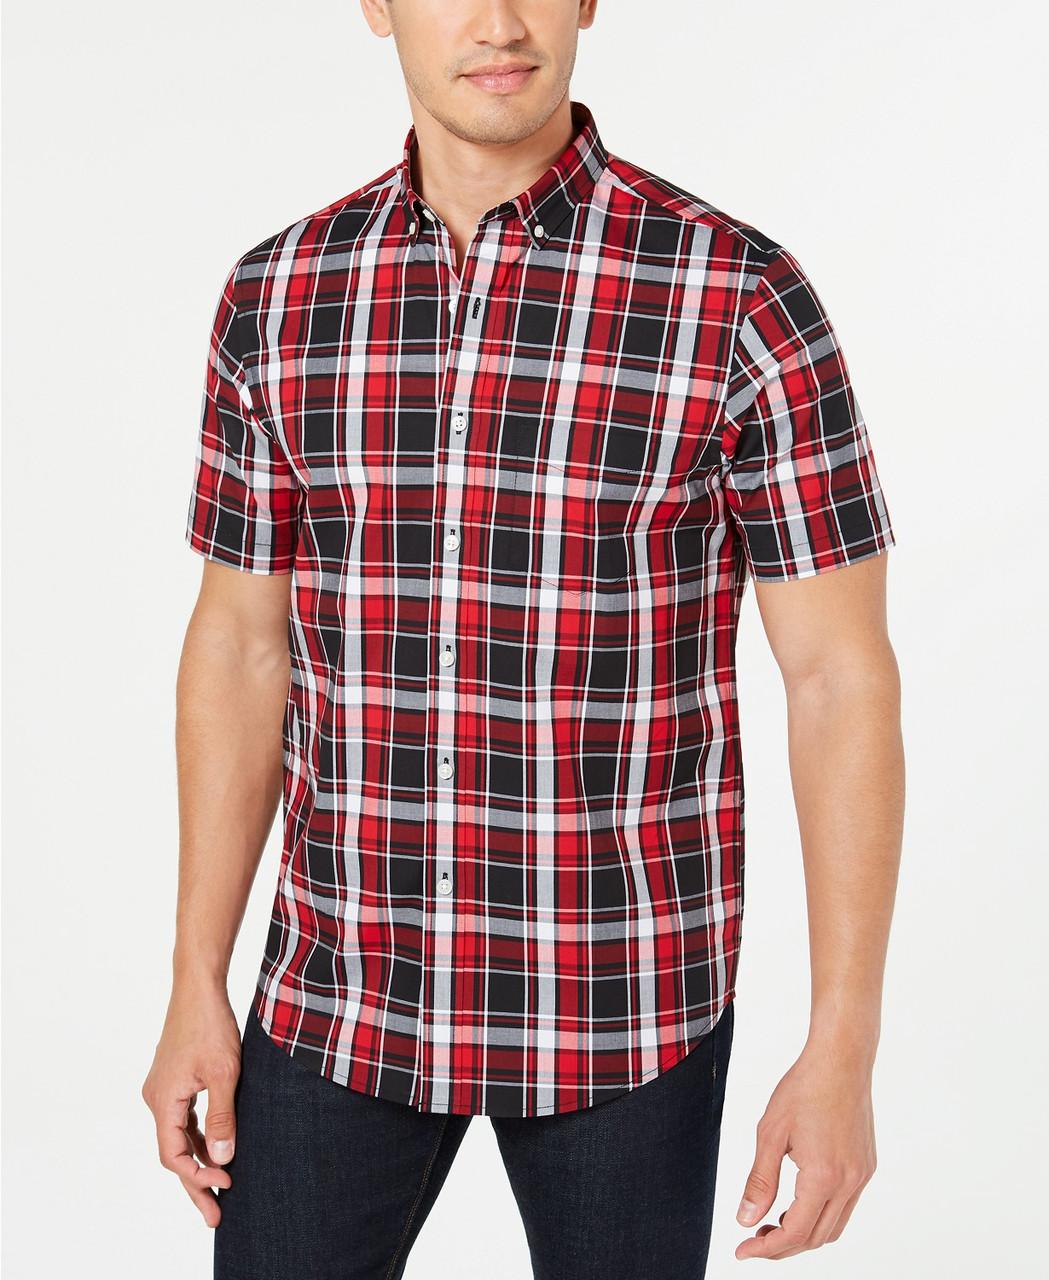 Club Room Мужская рубашка - Е2